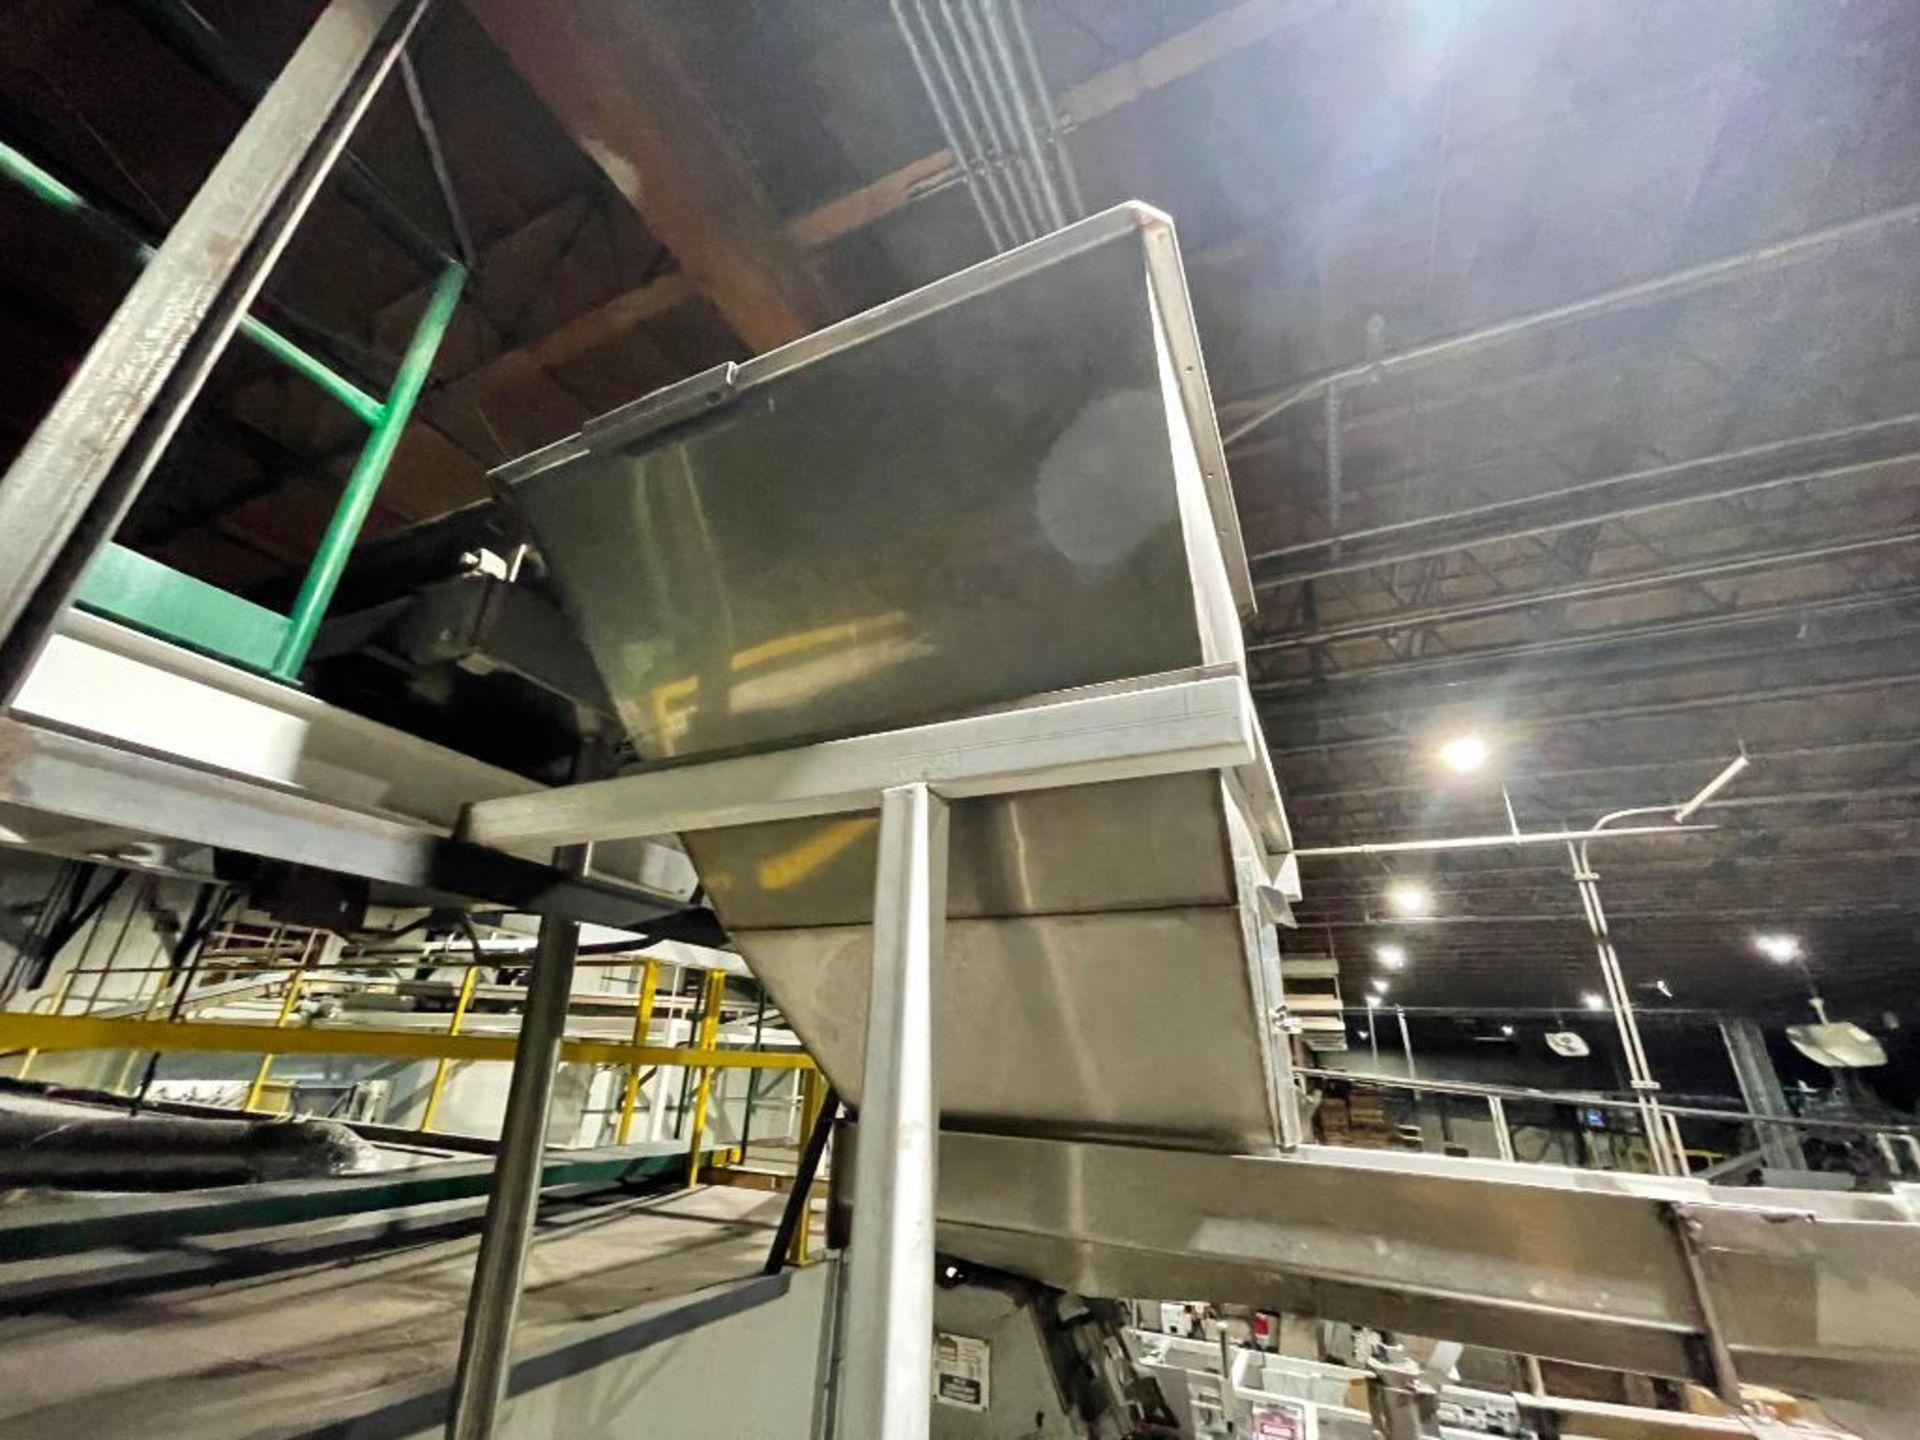 Eriez vibratory conveyor - Image 4 of 12